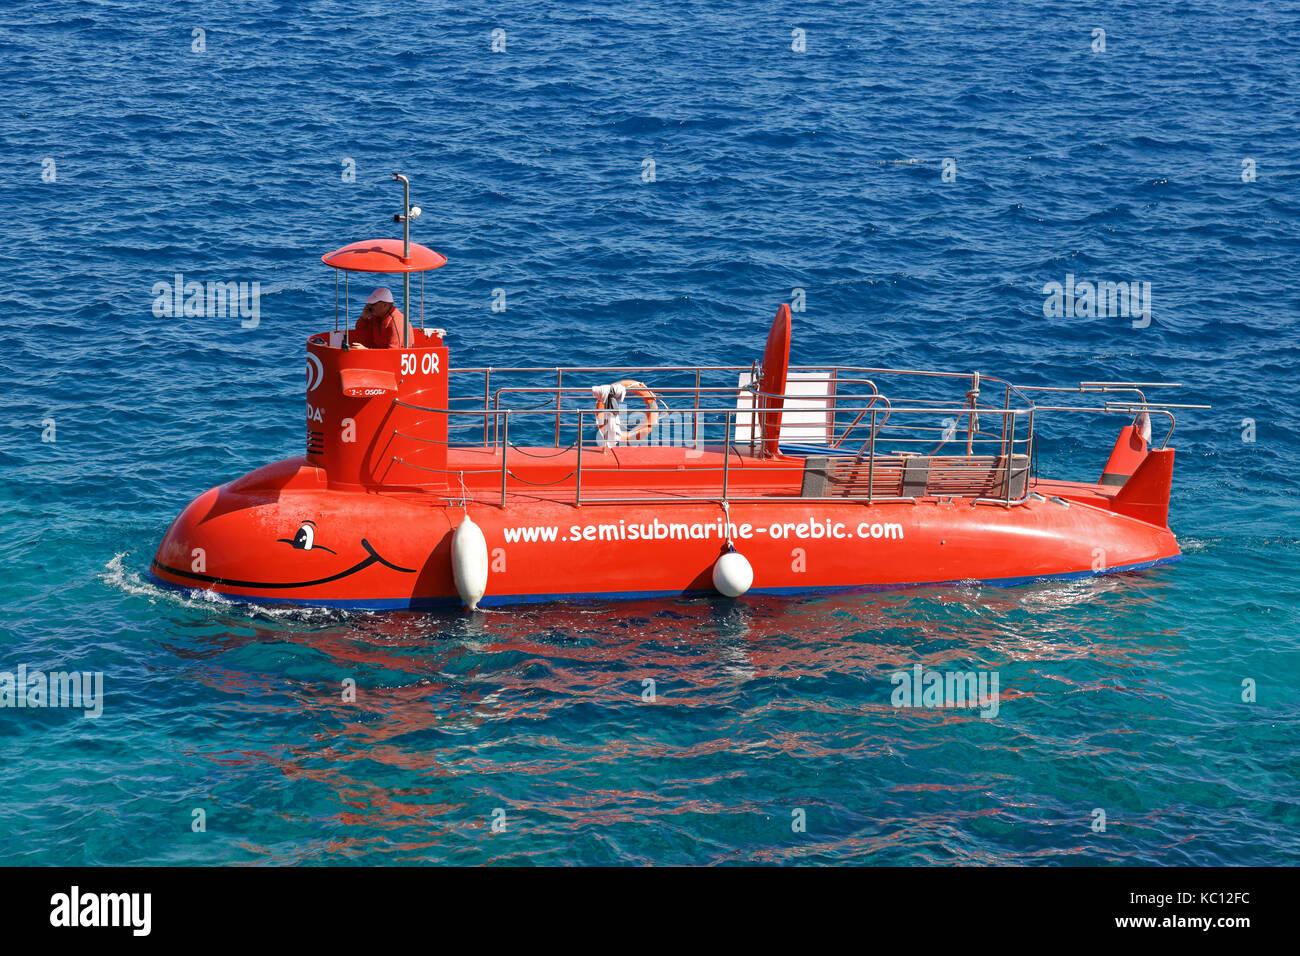 Semisubmarine, under the sea surface tours, Korcula Town, Korcula Island, Croatia, Dalmatia, Dalmatian Coast, Europe. - Stock Image